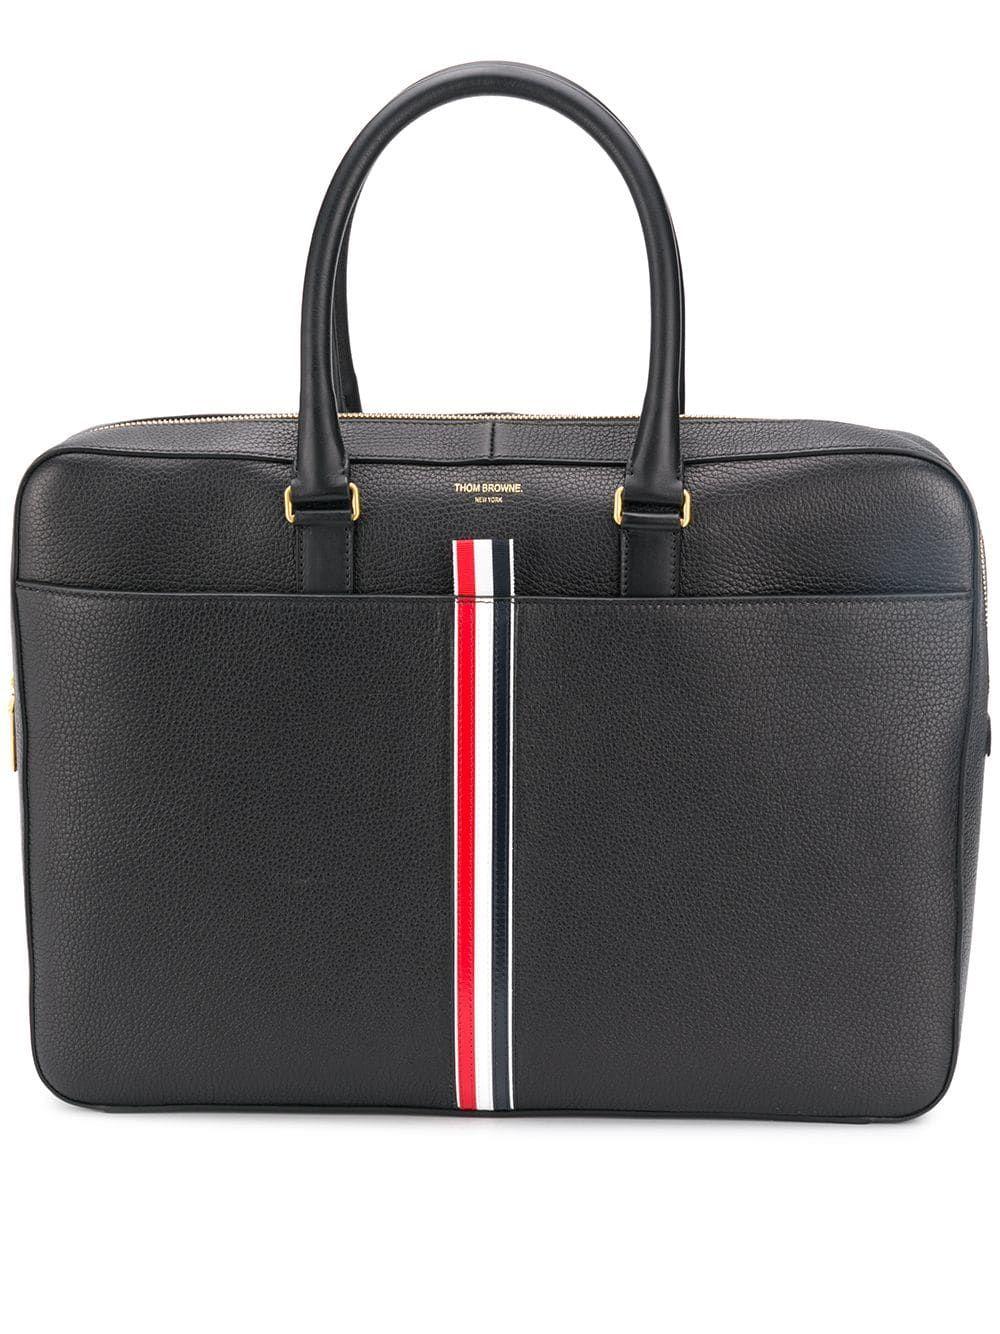 THOM BROWNE THOM BROWNE LOGO STRIP LAPTOP BAG - BLACK.  thombrowne  bags   leather  hand bags 21009f5f5edbc